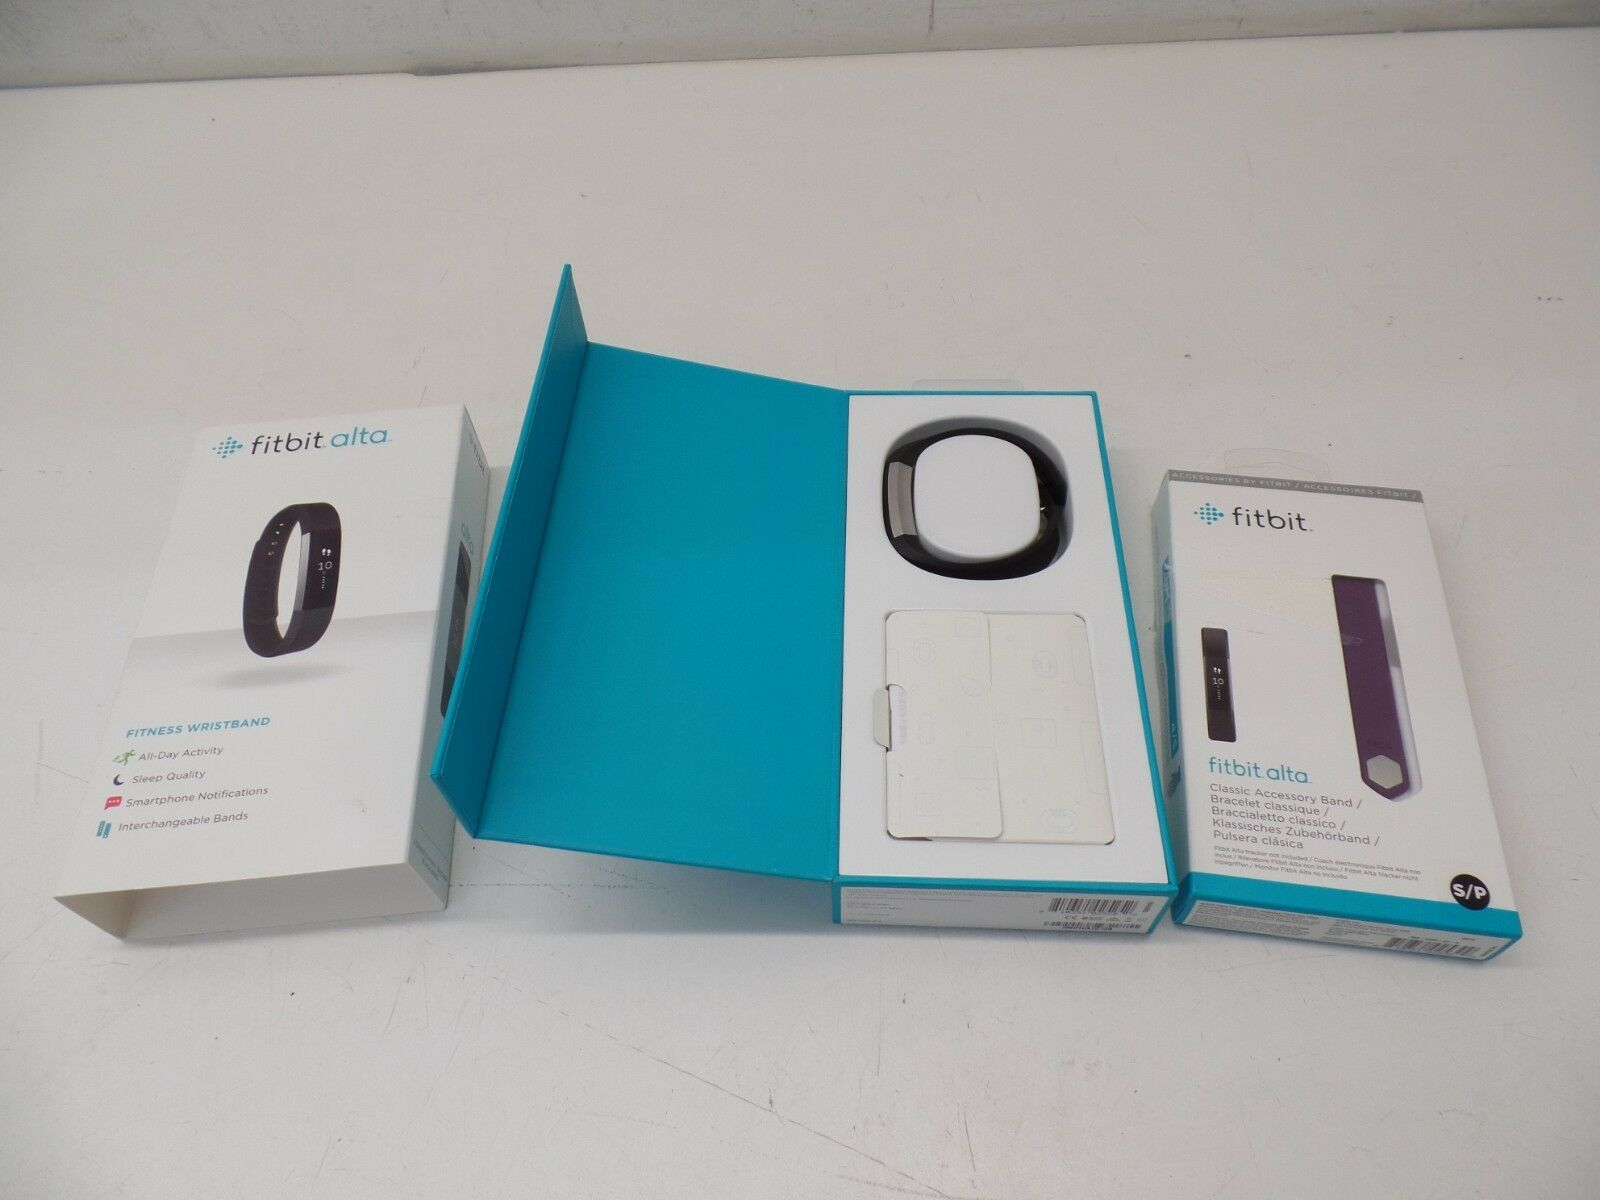 Fitbit Alta + Bonus Small Band